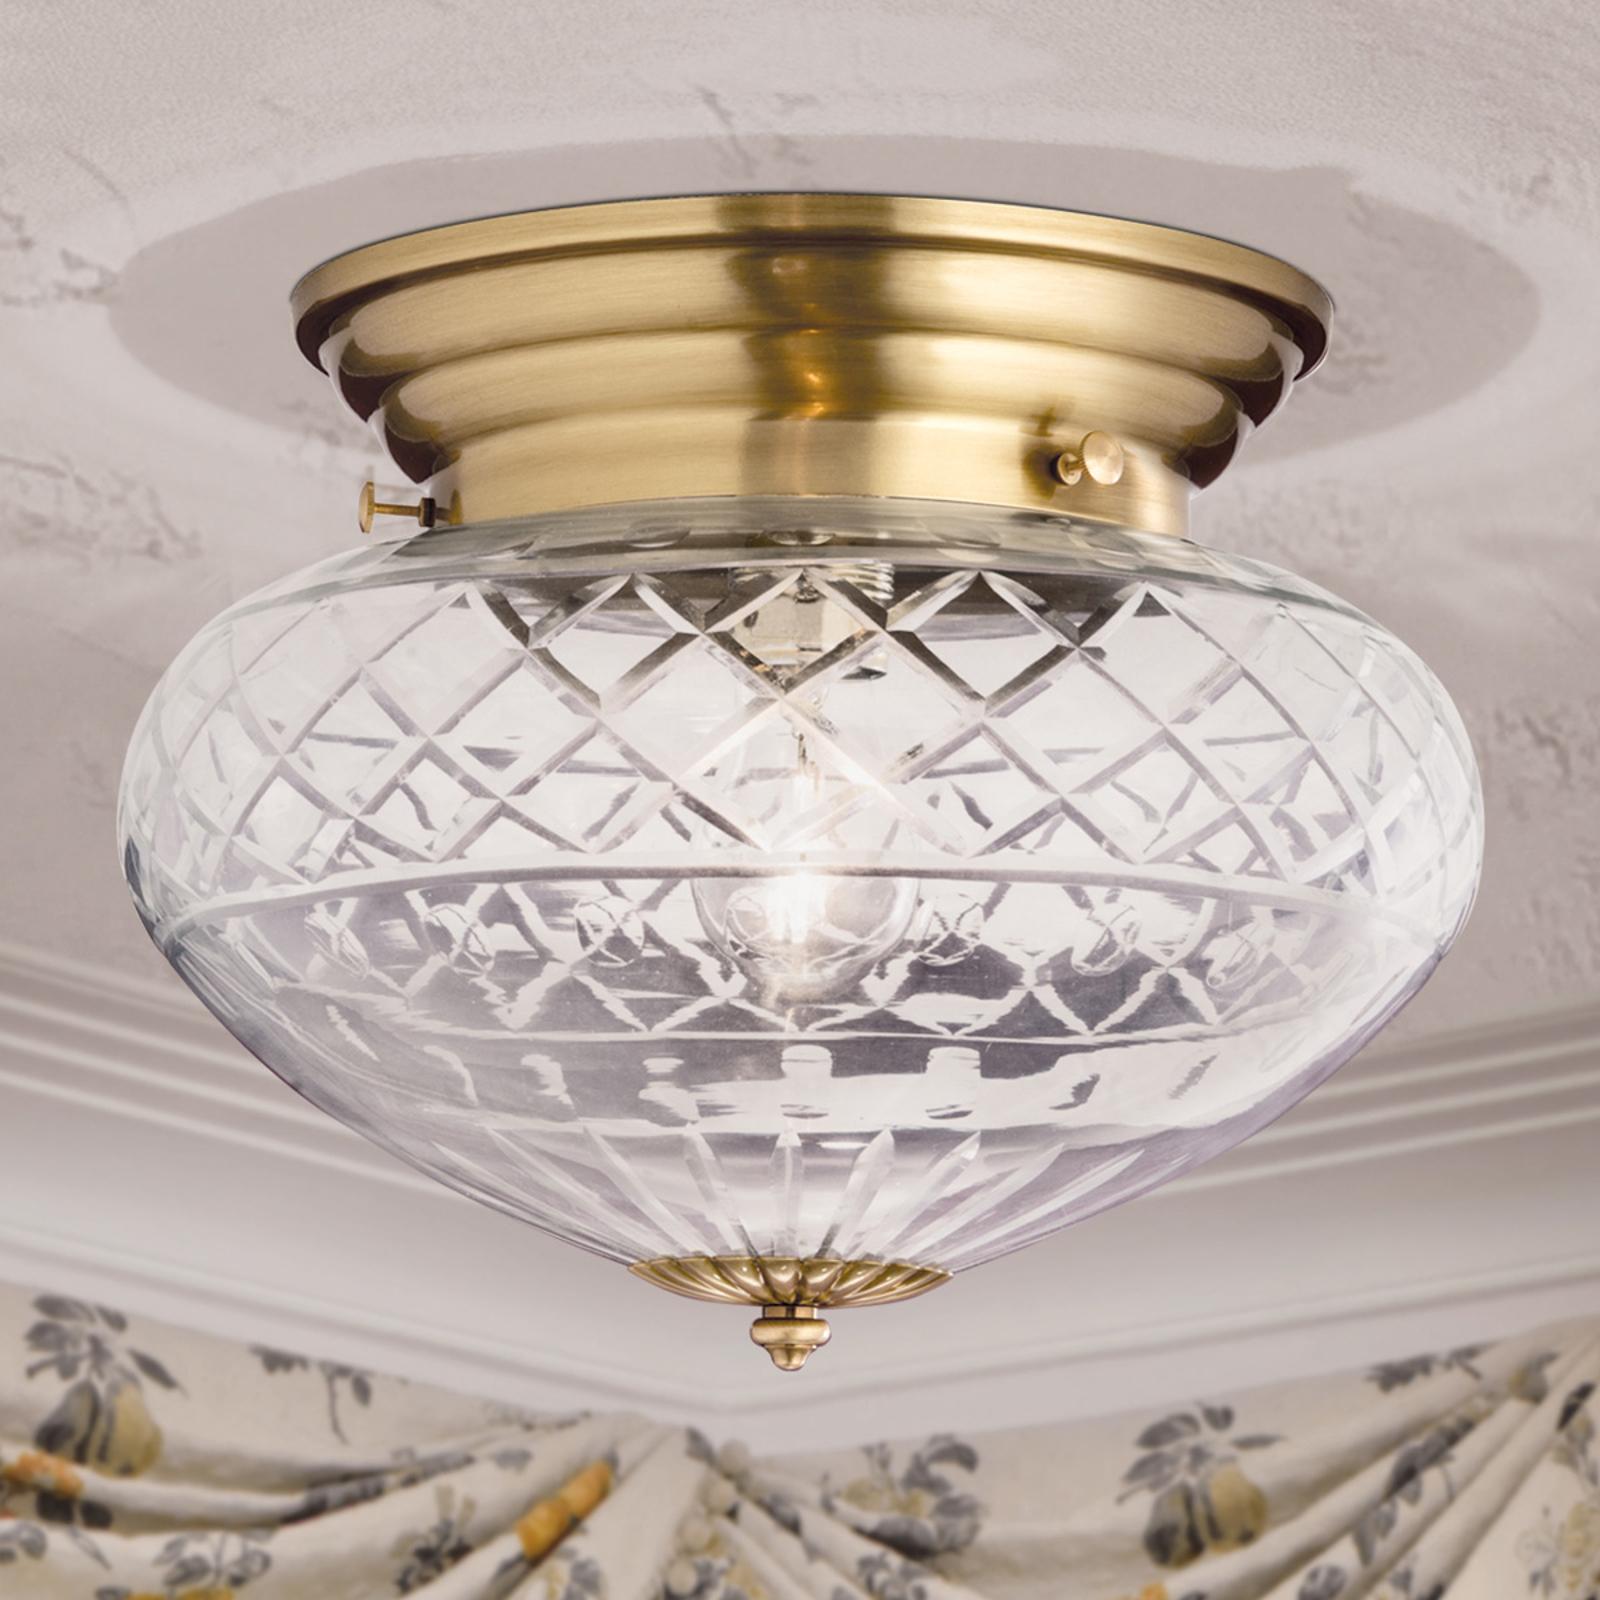 Handgeslepen plafondlamp ENNA, diameter 31 cm